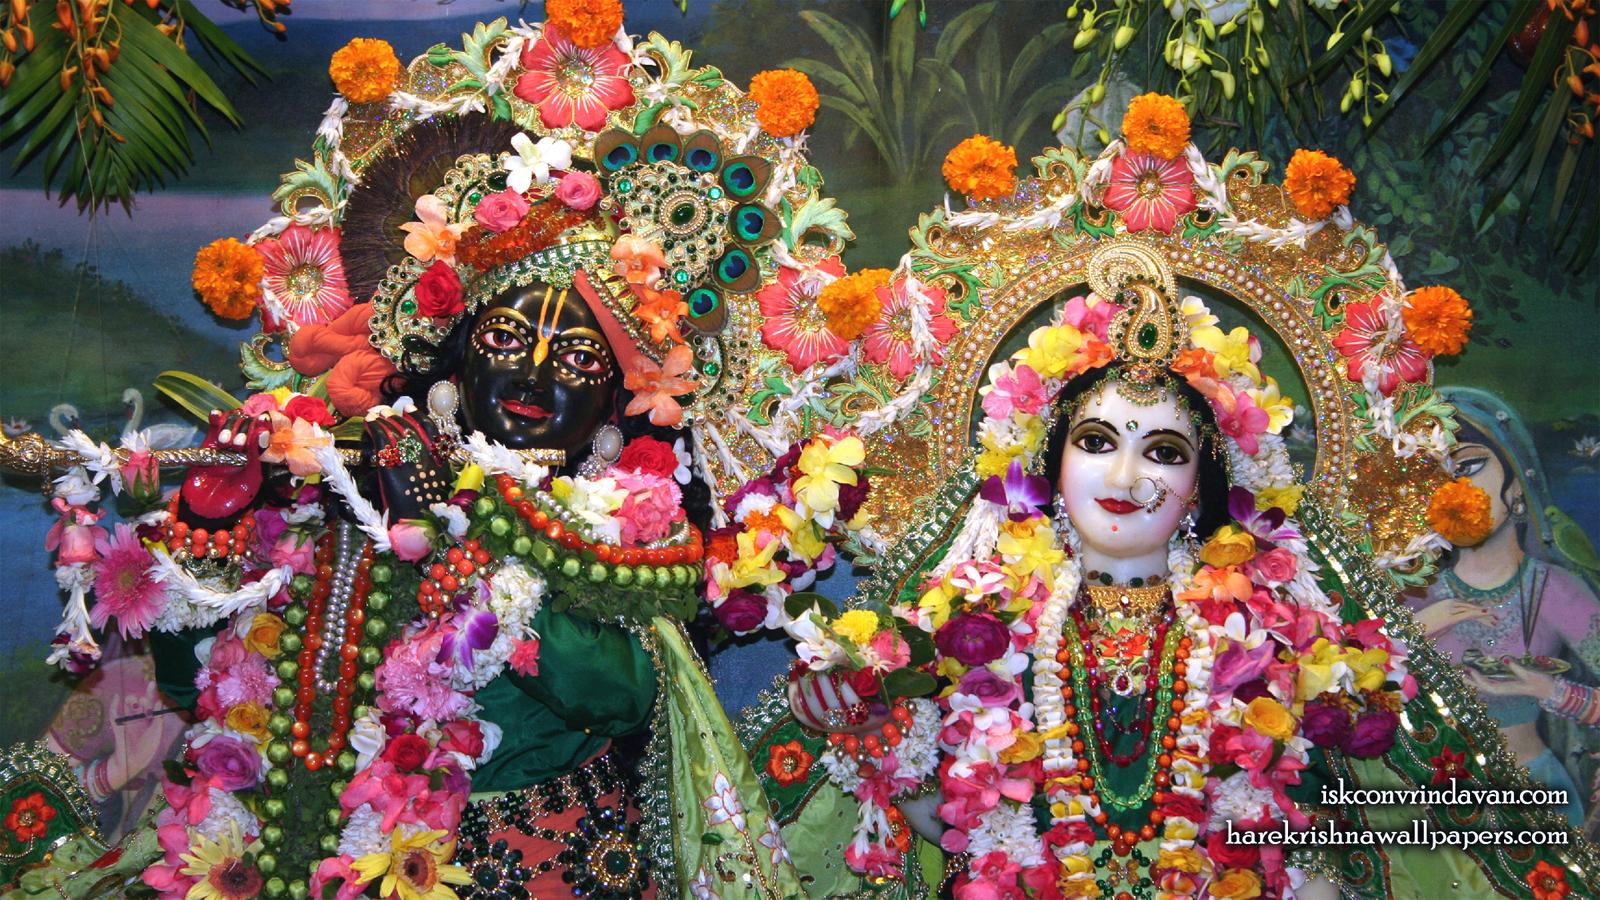 Sri Sri Radha Shyamsundar Close up Wallpaper (002) Size 1600x900 Download